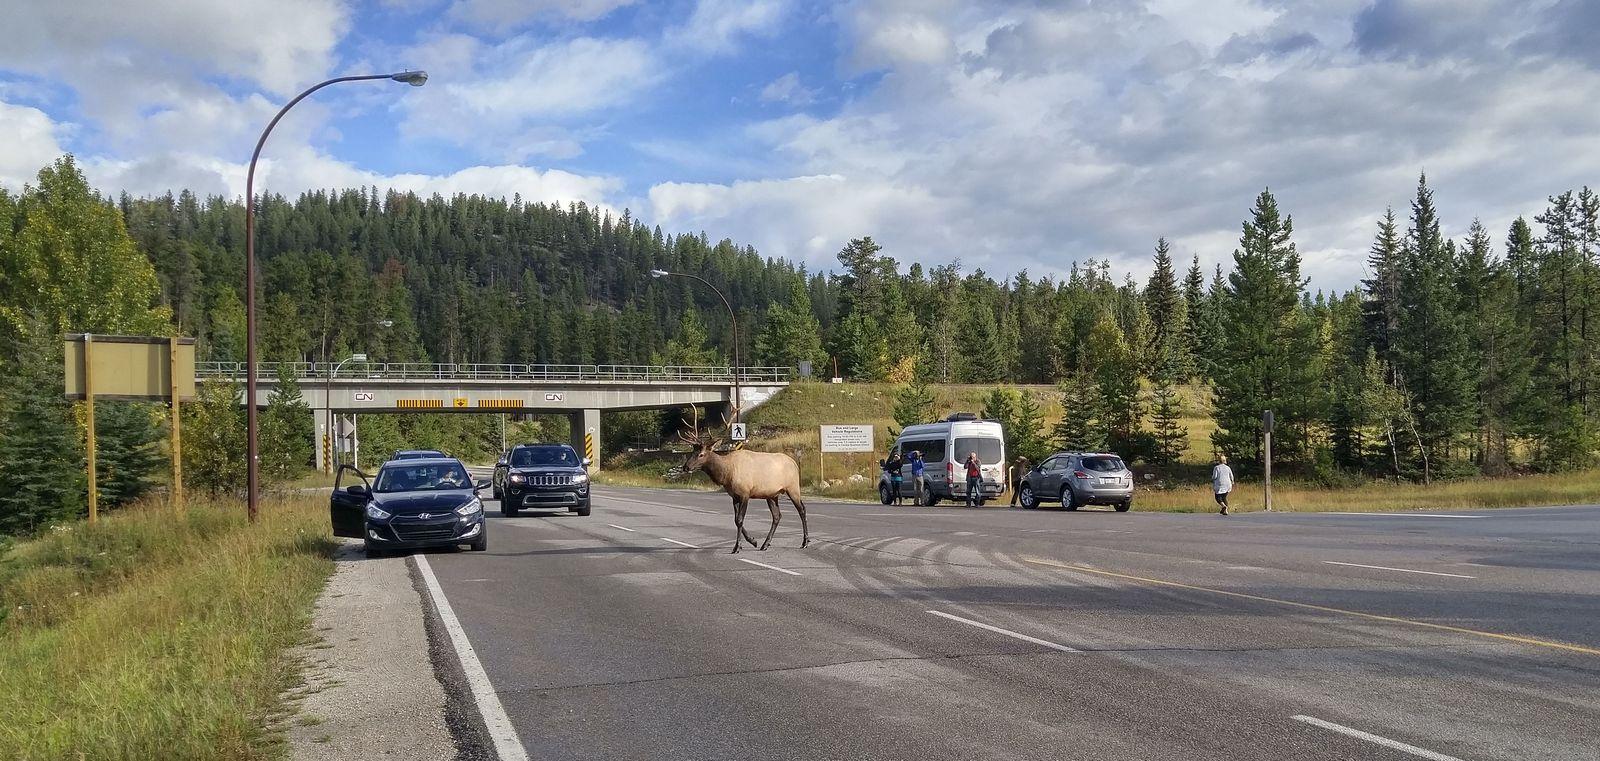 ¿Por qué el ciervo cruzó la carretera?